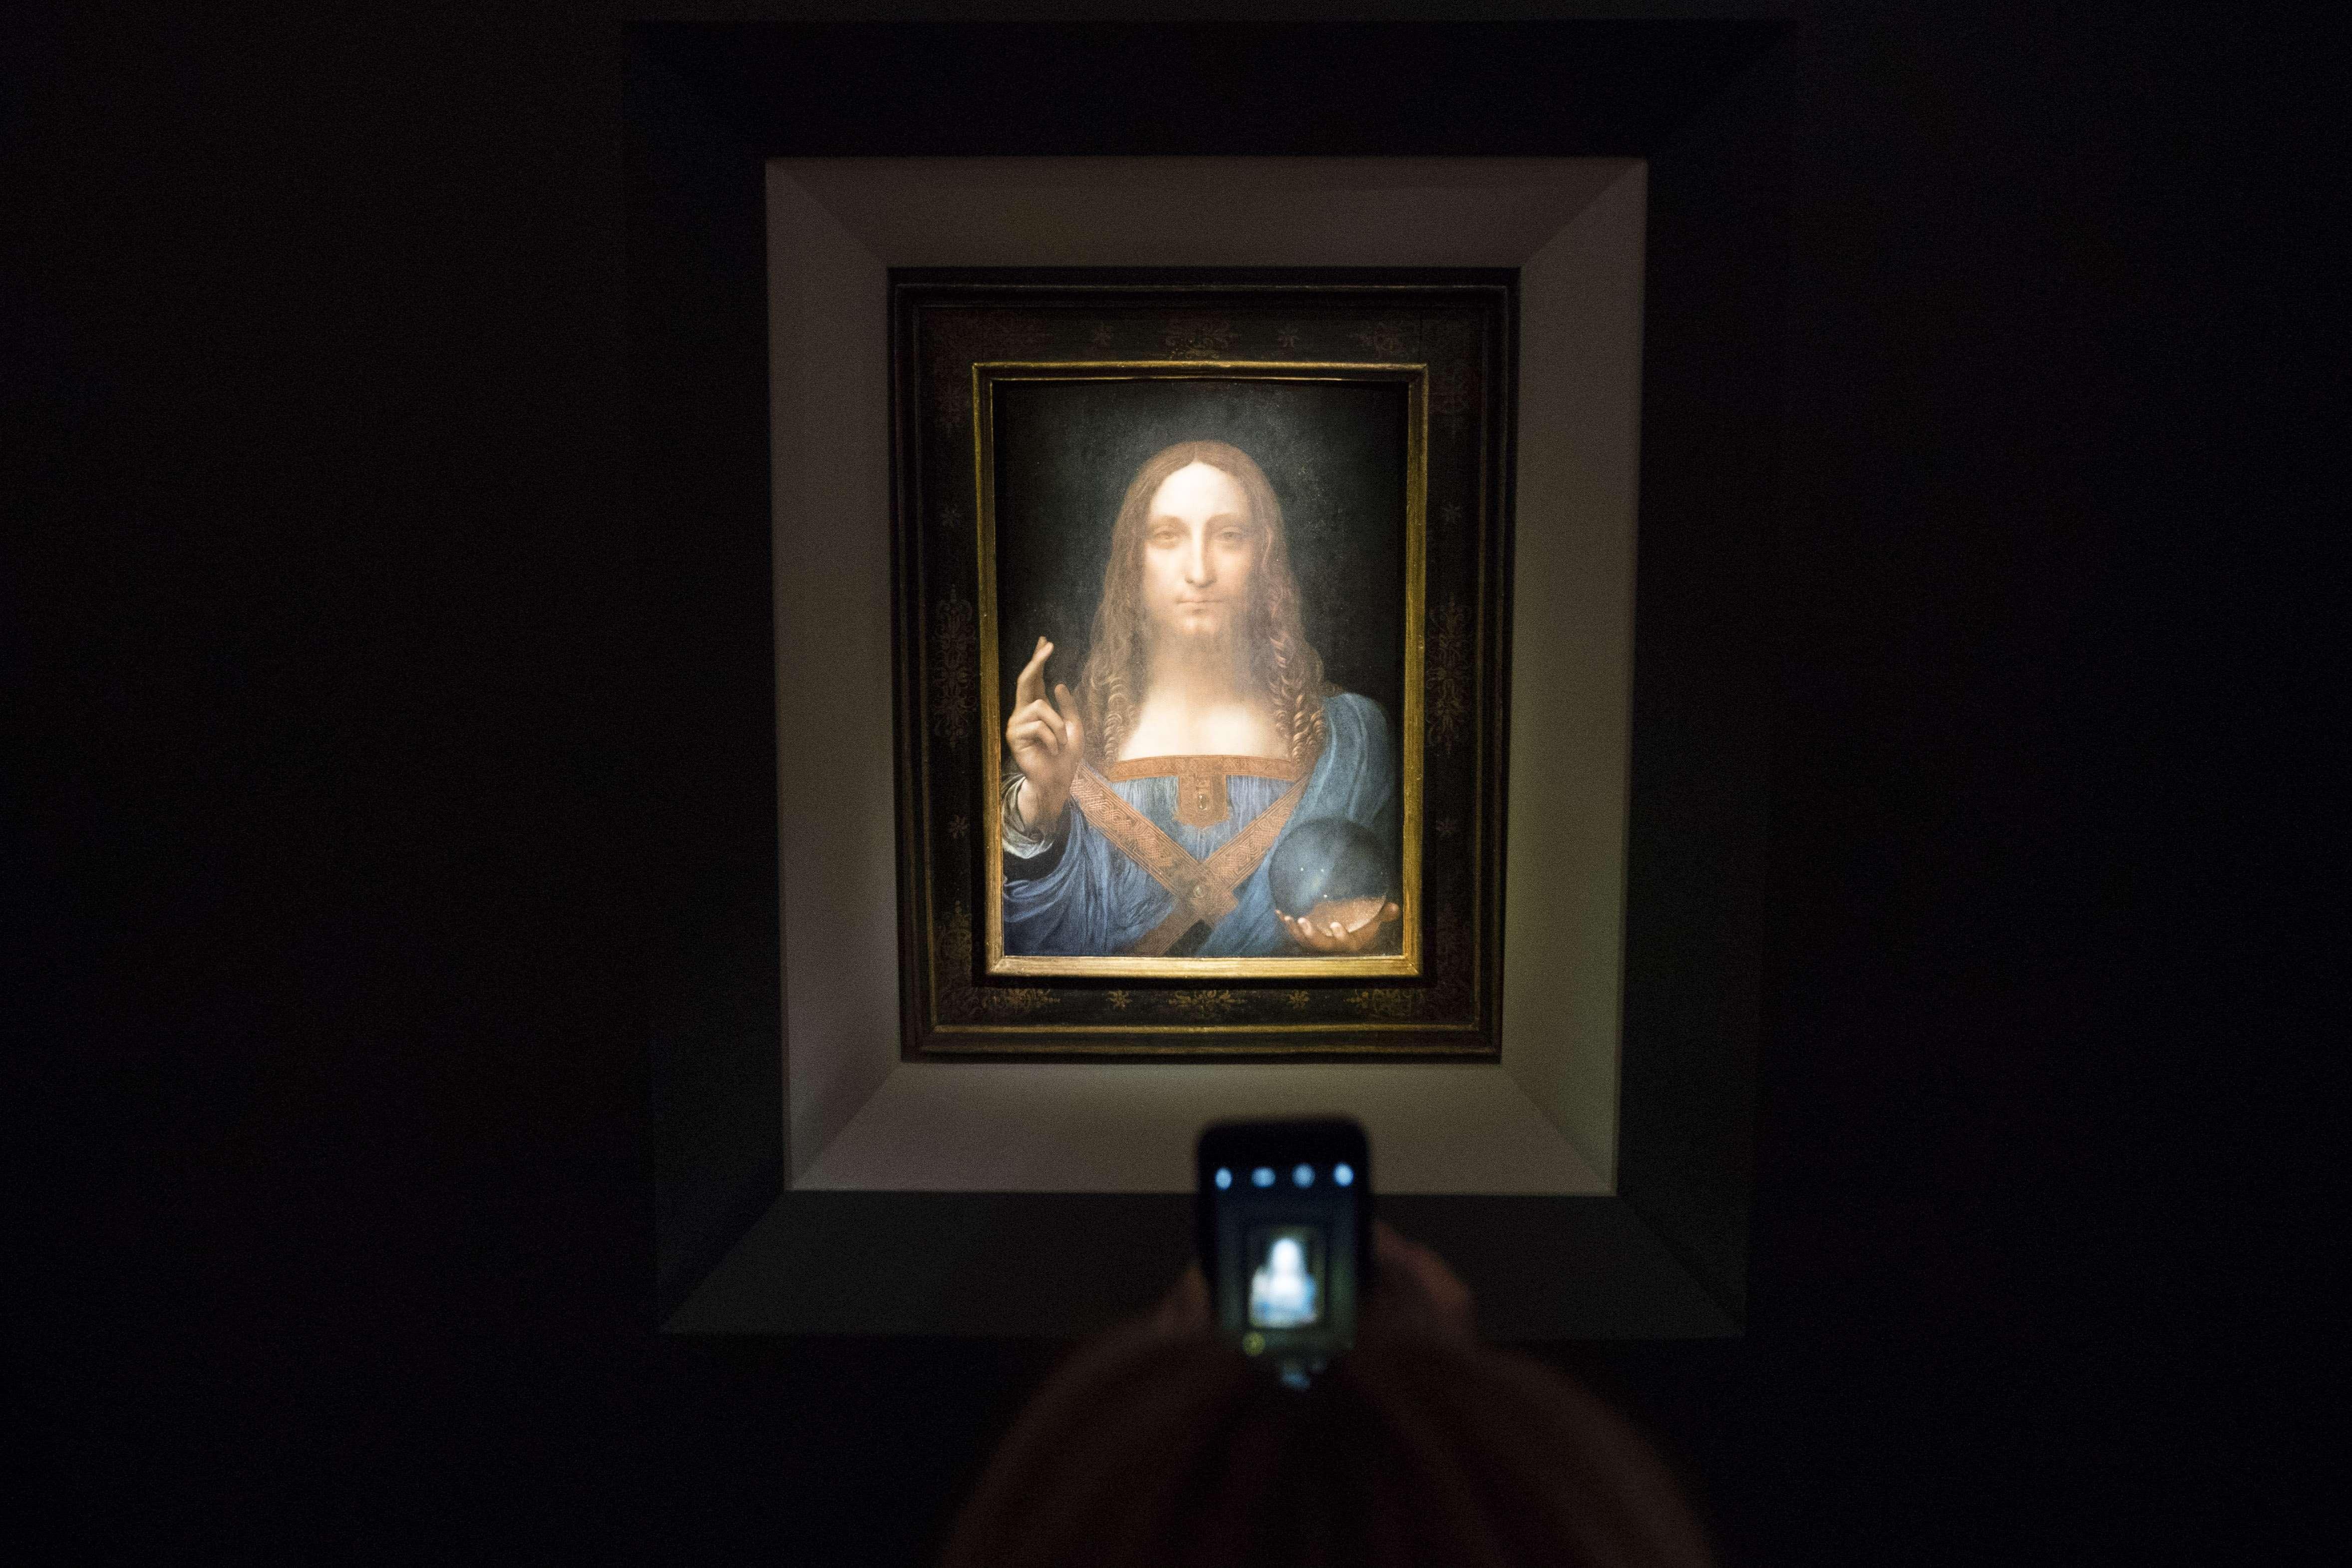 Leilão de retrato de Cristo feito por da Vinci bate recorde